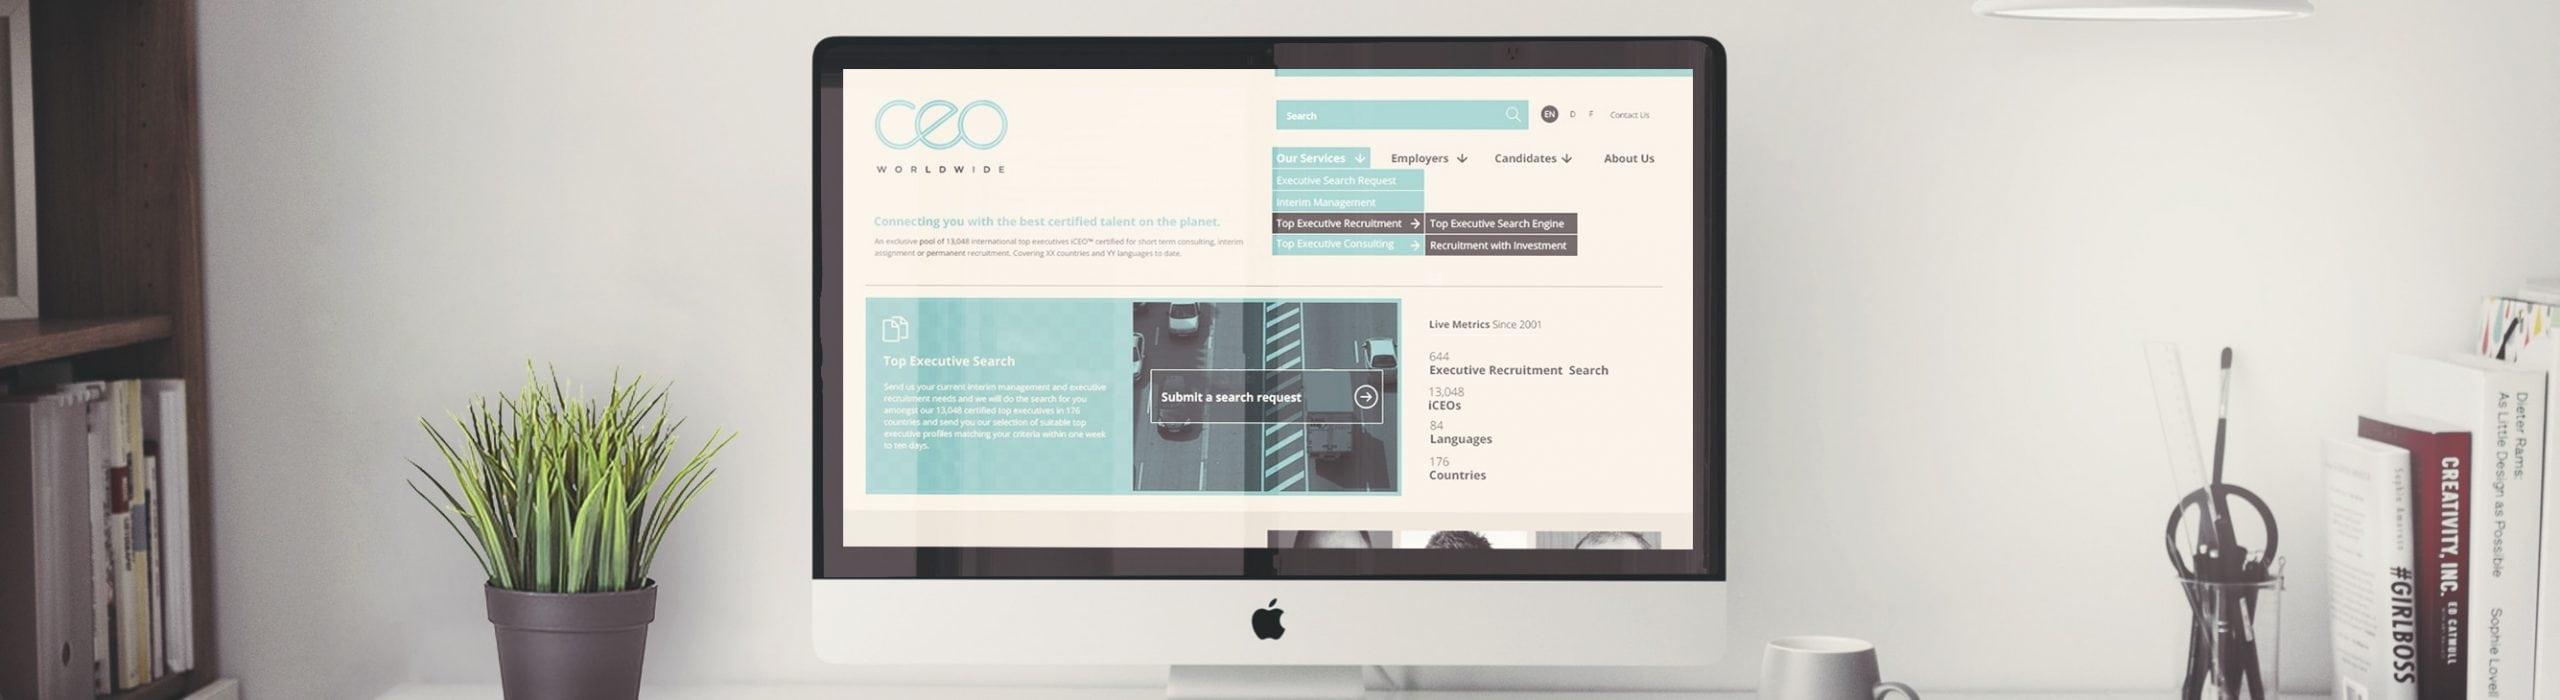 CEO Worldwide - natie-ceo-worldwide-website-01 - Natie Branding Agency